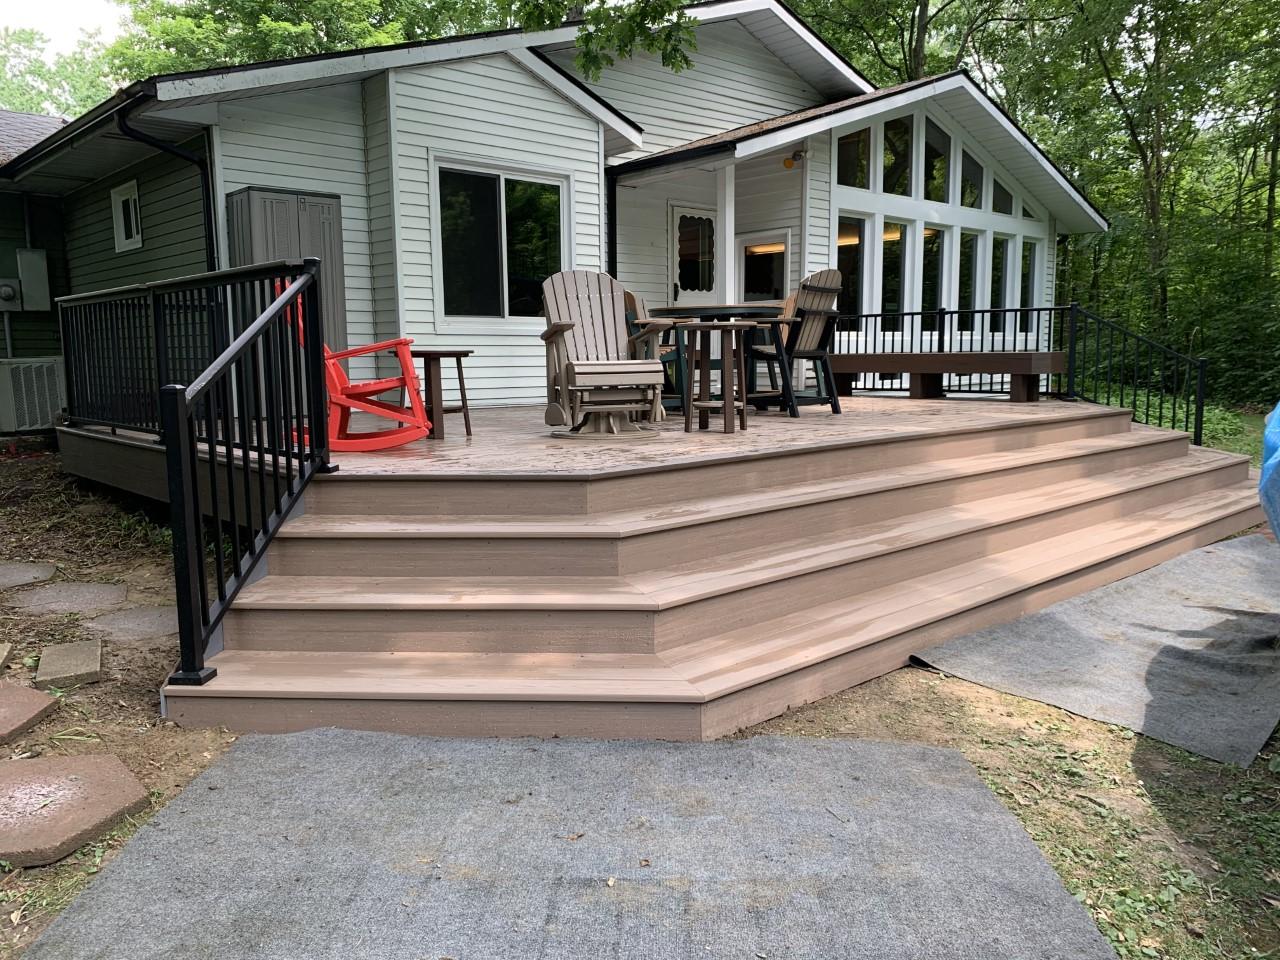 Stunning-new-AZEK-deck-addition-in-Fort-Wayne